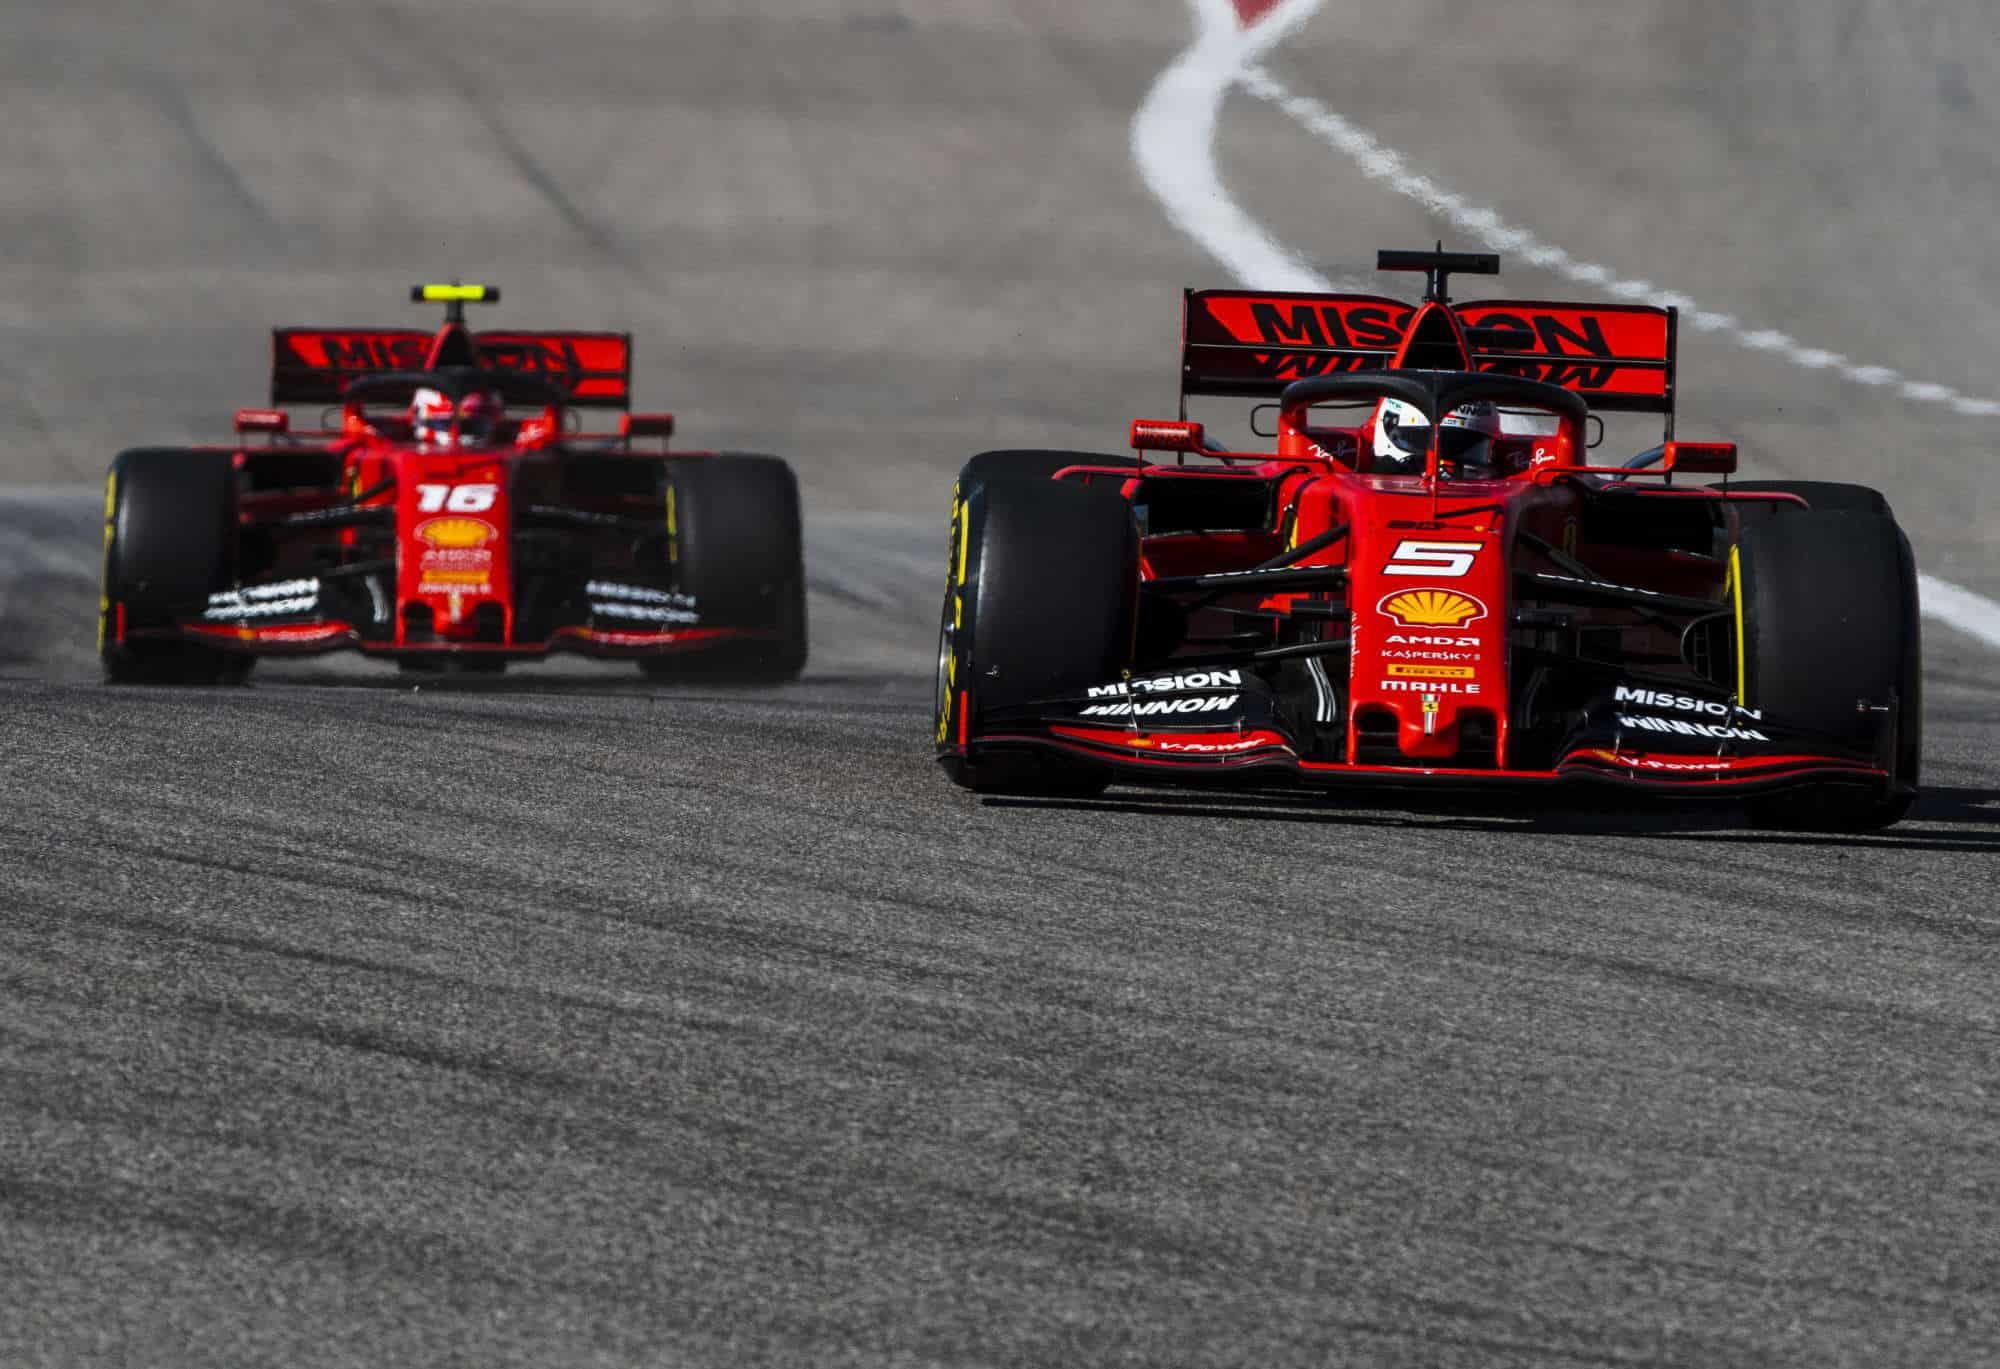 Leclerc Vettel Ferrari 2019 USA GP F1 2019